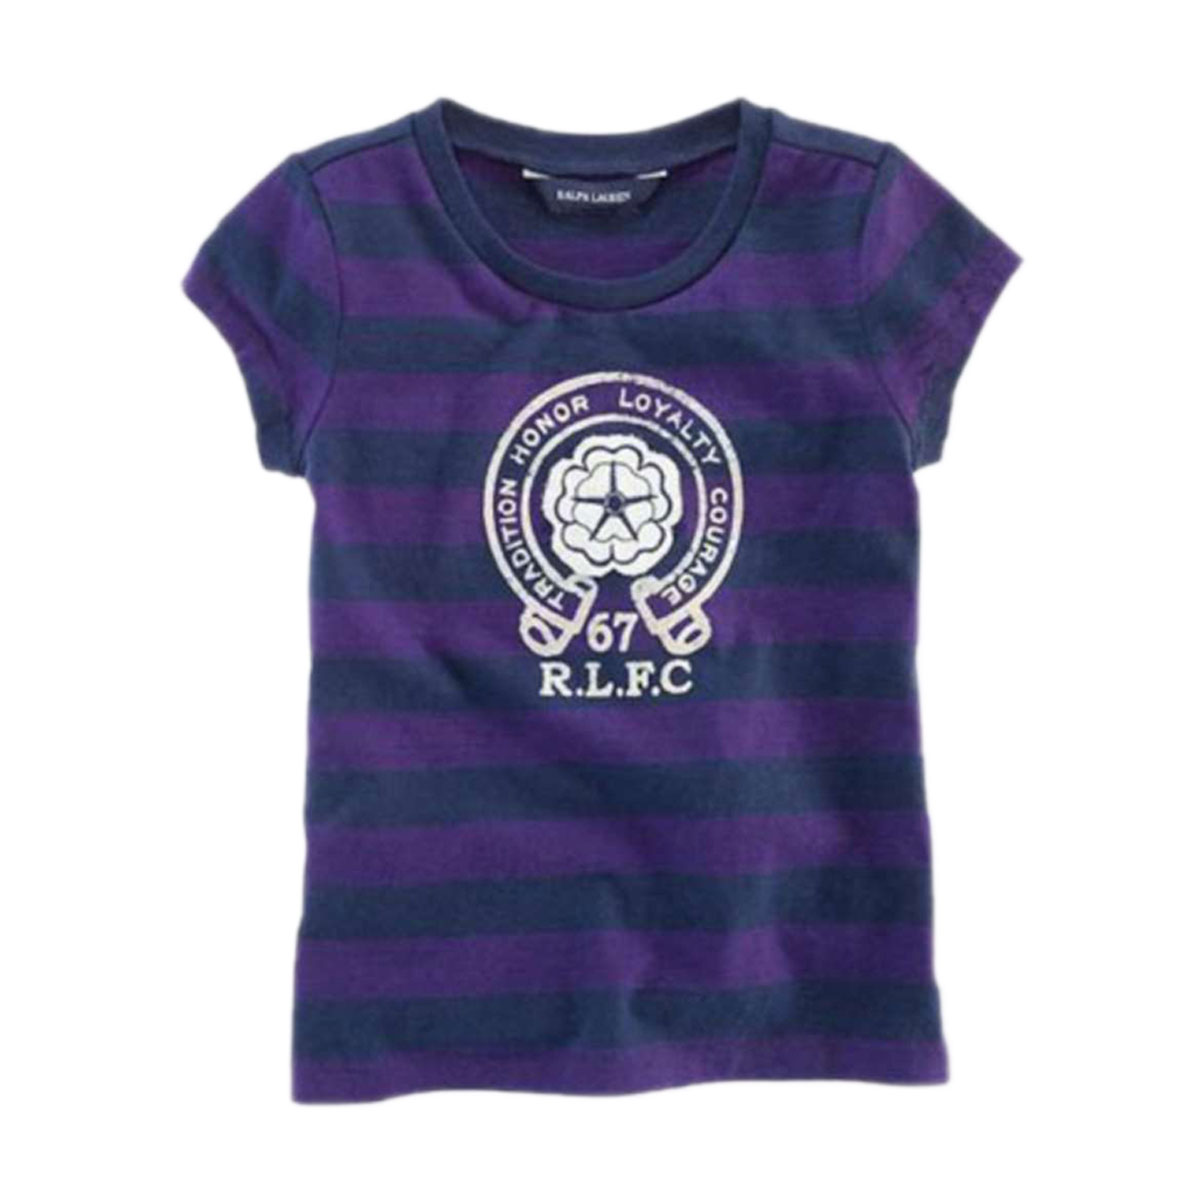 9947be720 25%OFF sale polo Ralph Lauren kids POLO RALPH LAUREN CHILDREN regular  article children s clothes girls short sleeves T-shirt Striped Graphic Tee   13004978 ...